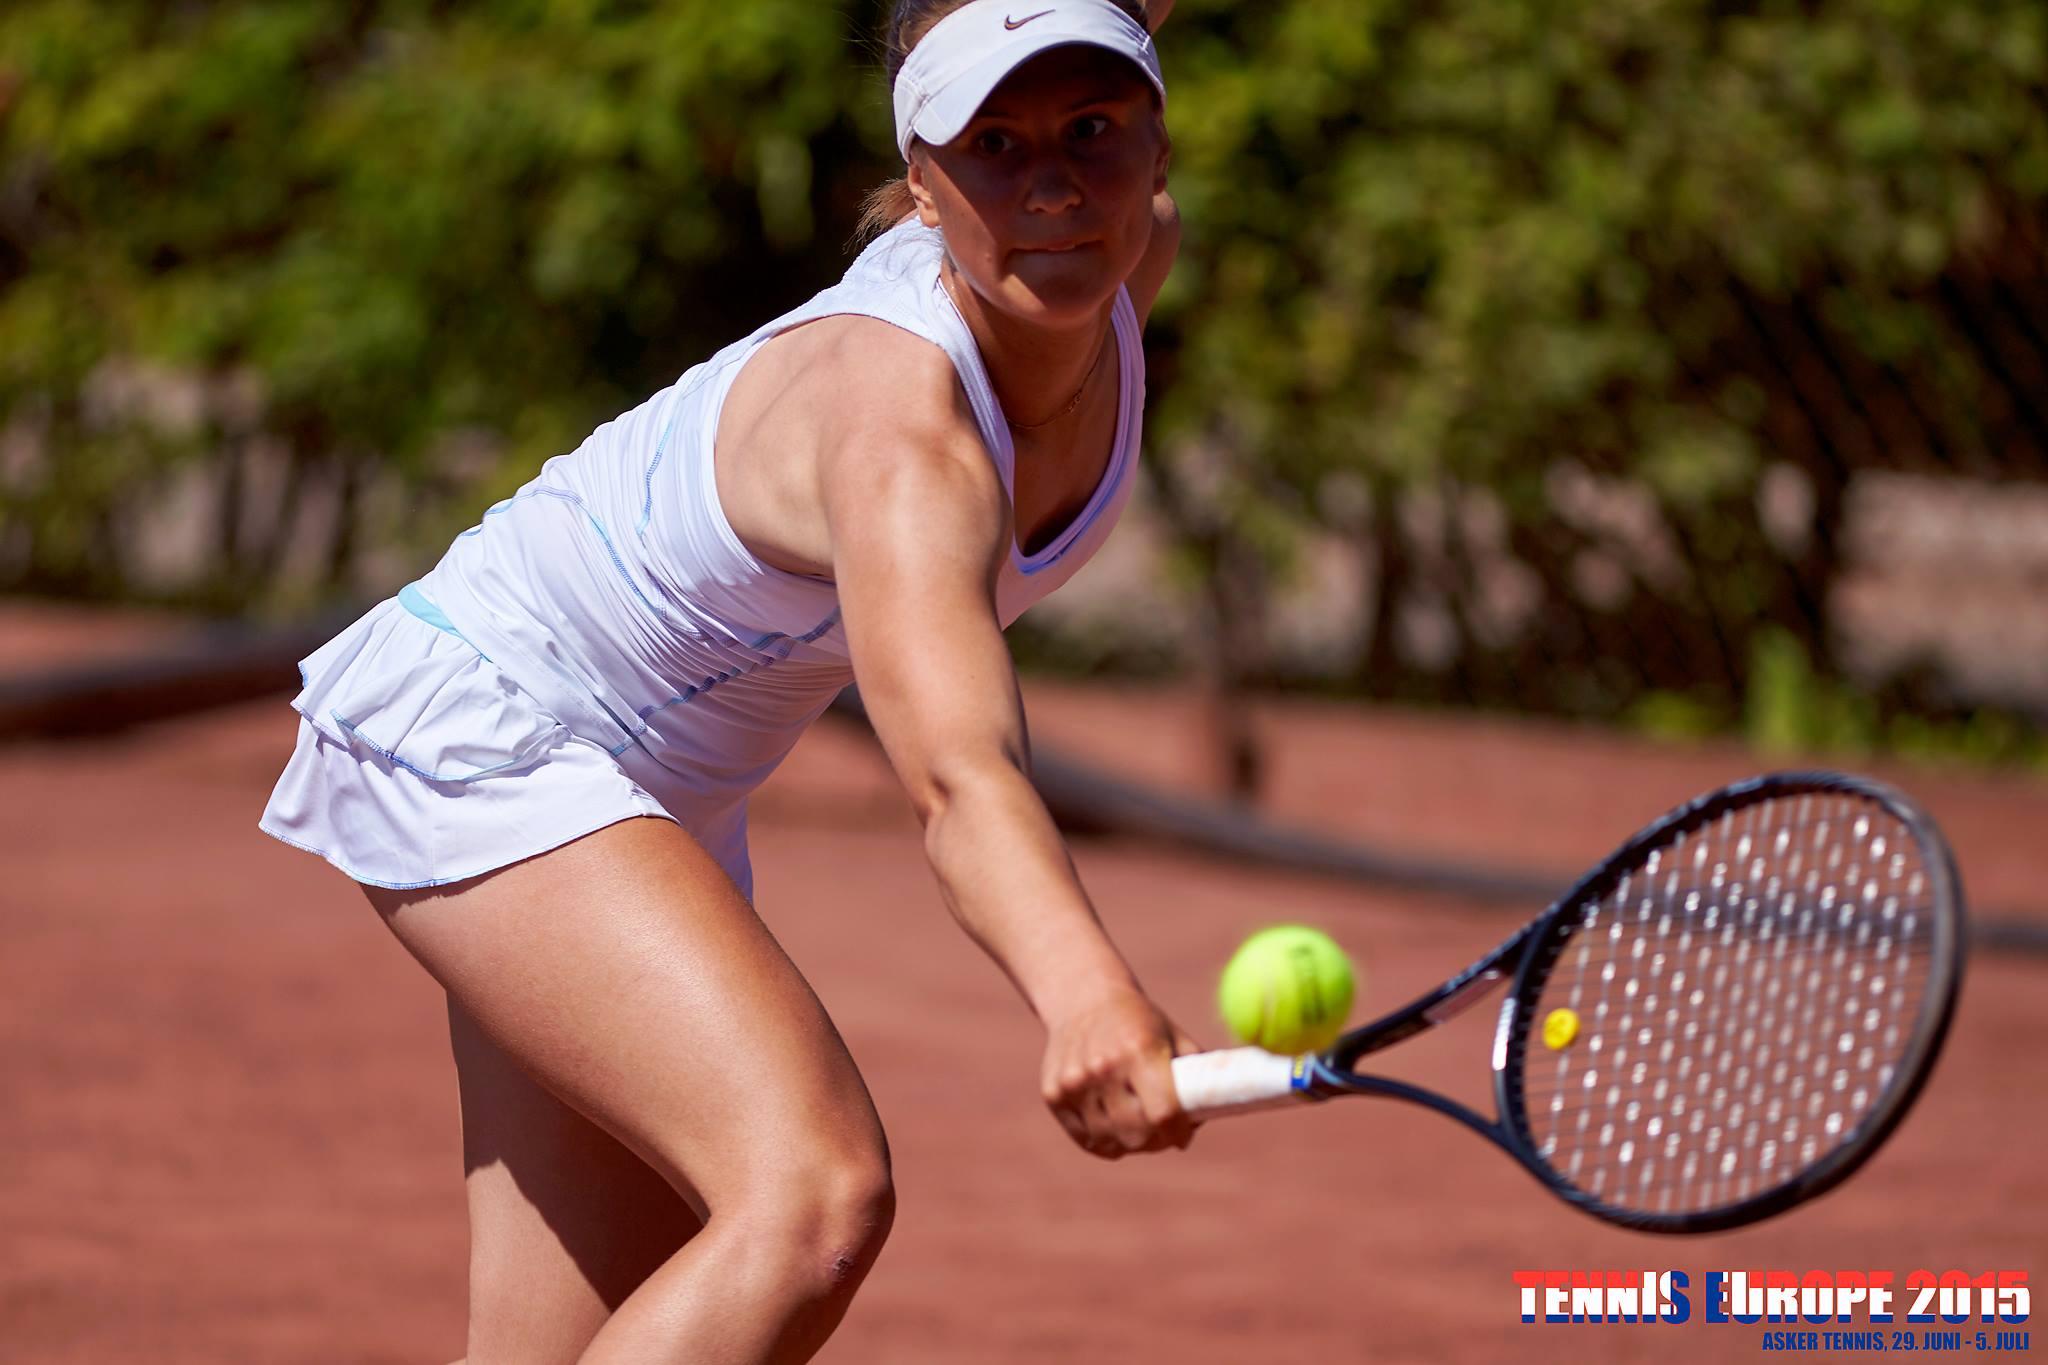 Svetlana Teterina